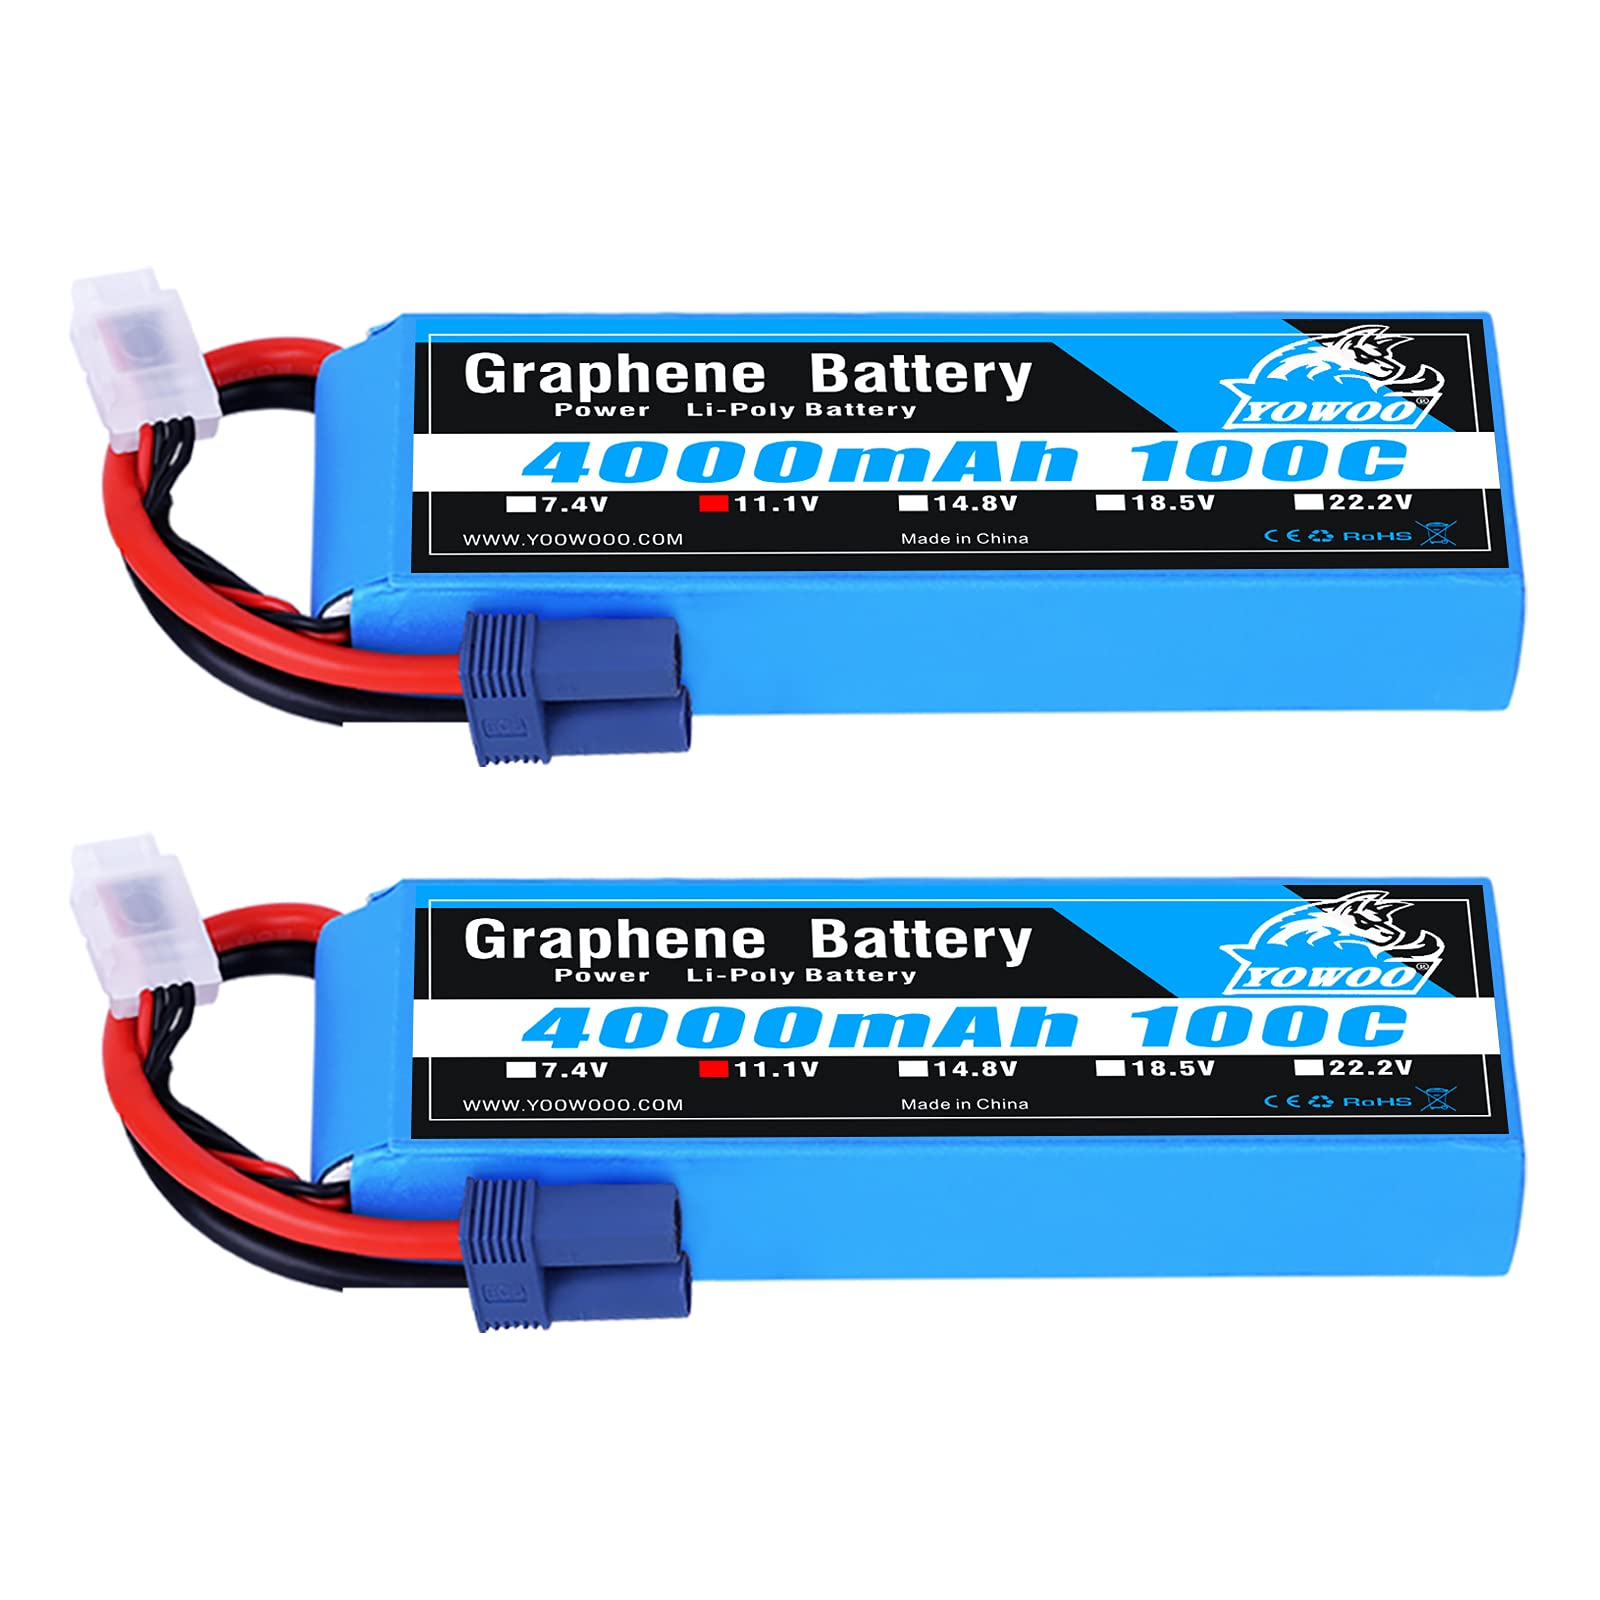 2 Baterias LIPO Grafeno 11.1V 4000mah 100C 3S EC3 Plug YoWoo